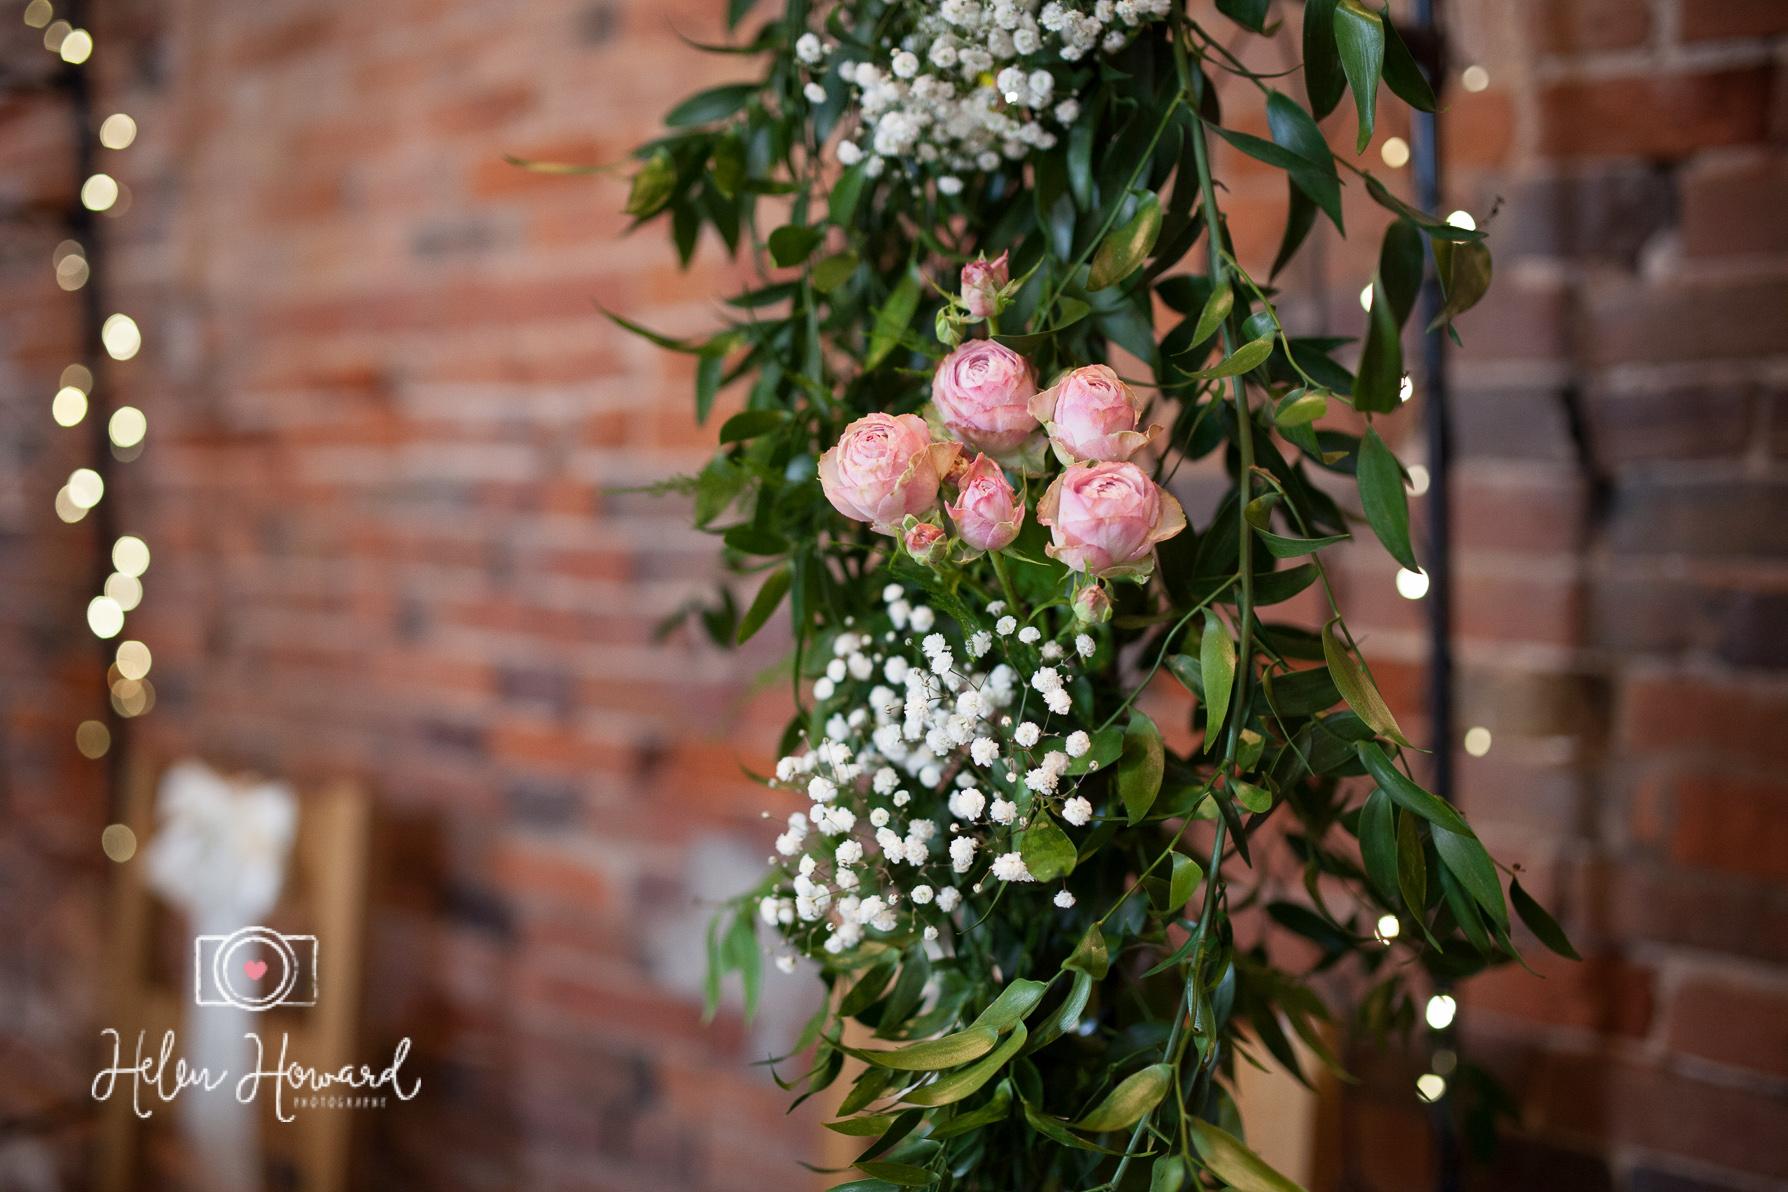 Helen Howard Photography Packington Moor Wedding-20.jpg